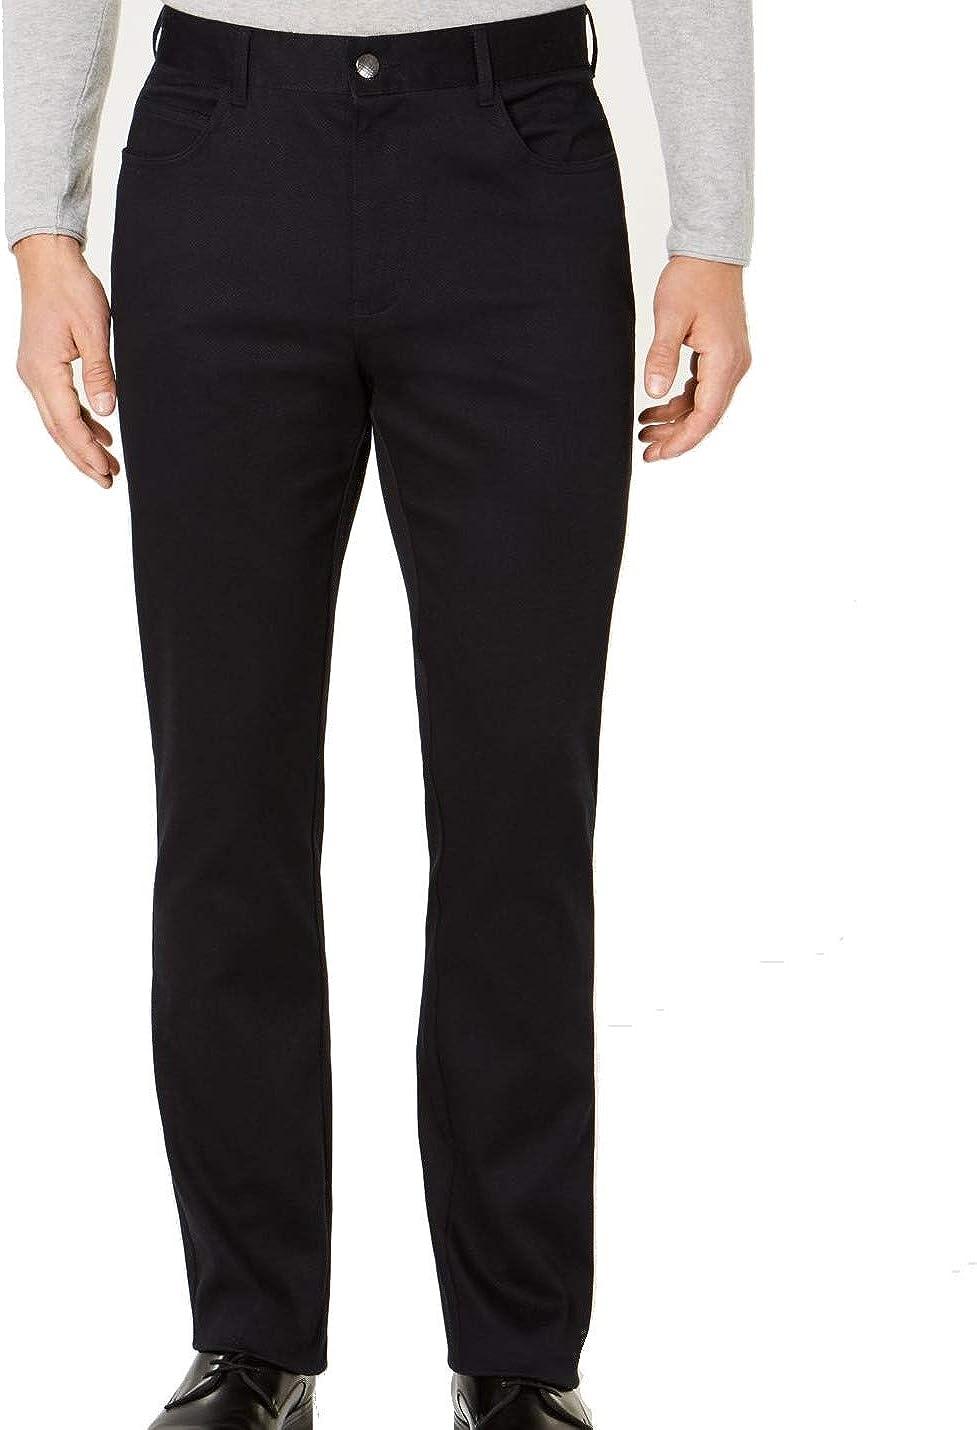 Ryan Seacrest Mens Cross Hatch Casual Chino Pants, Black, 40W x 30L